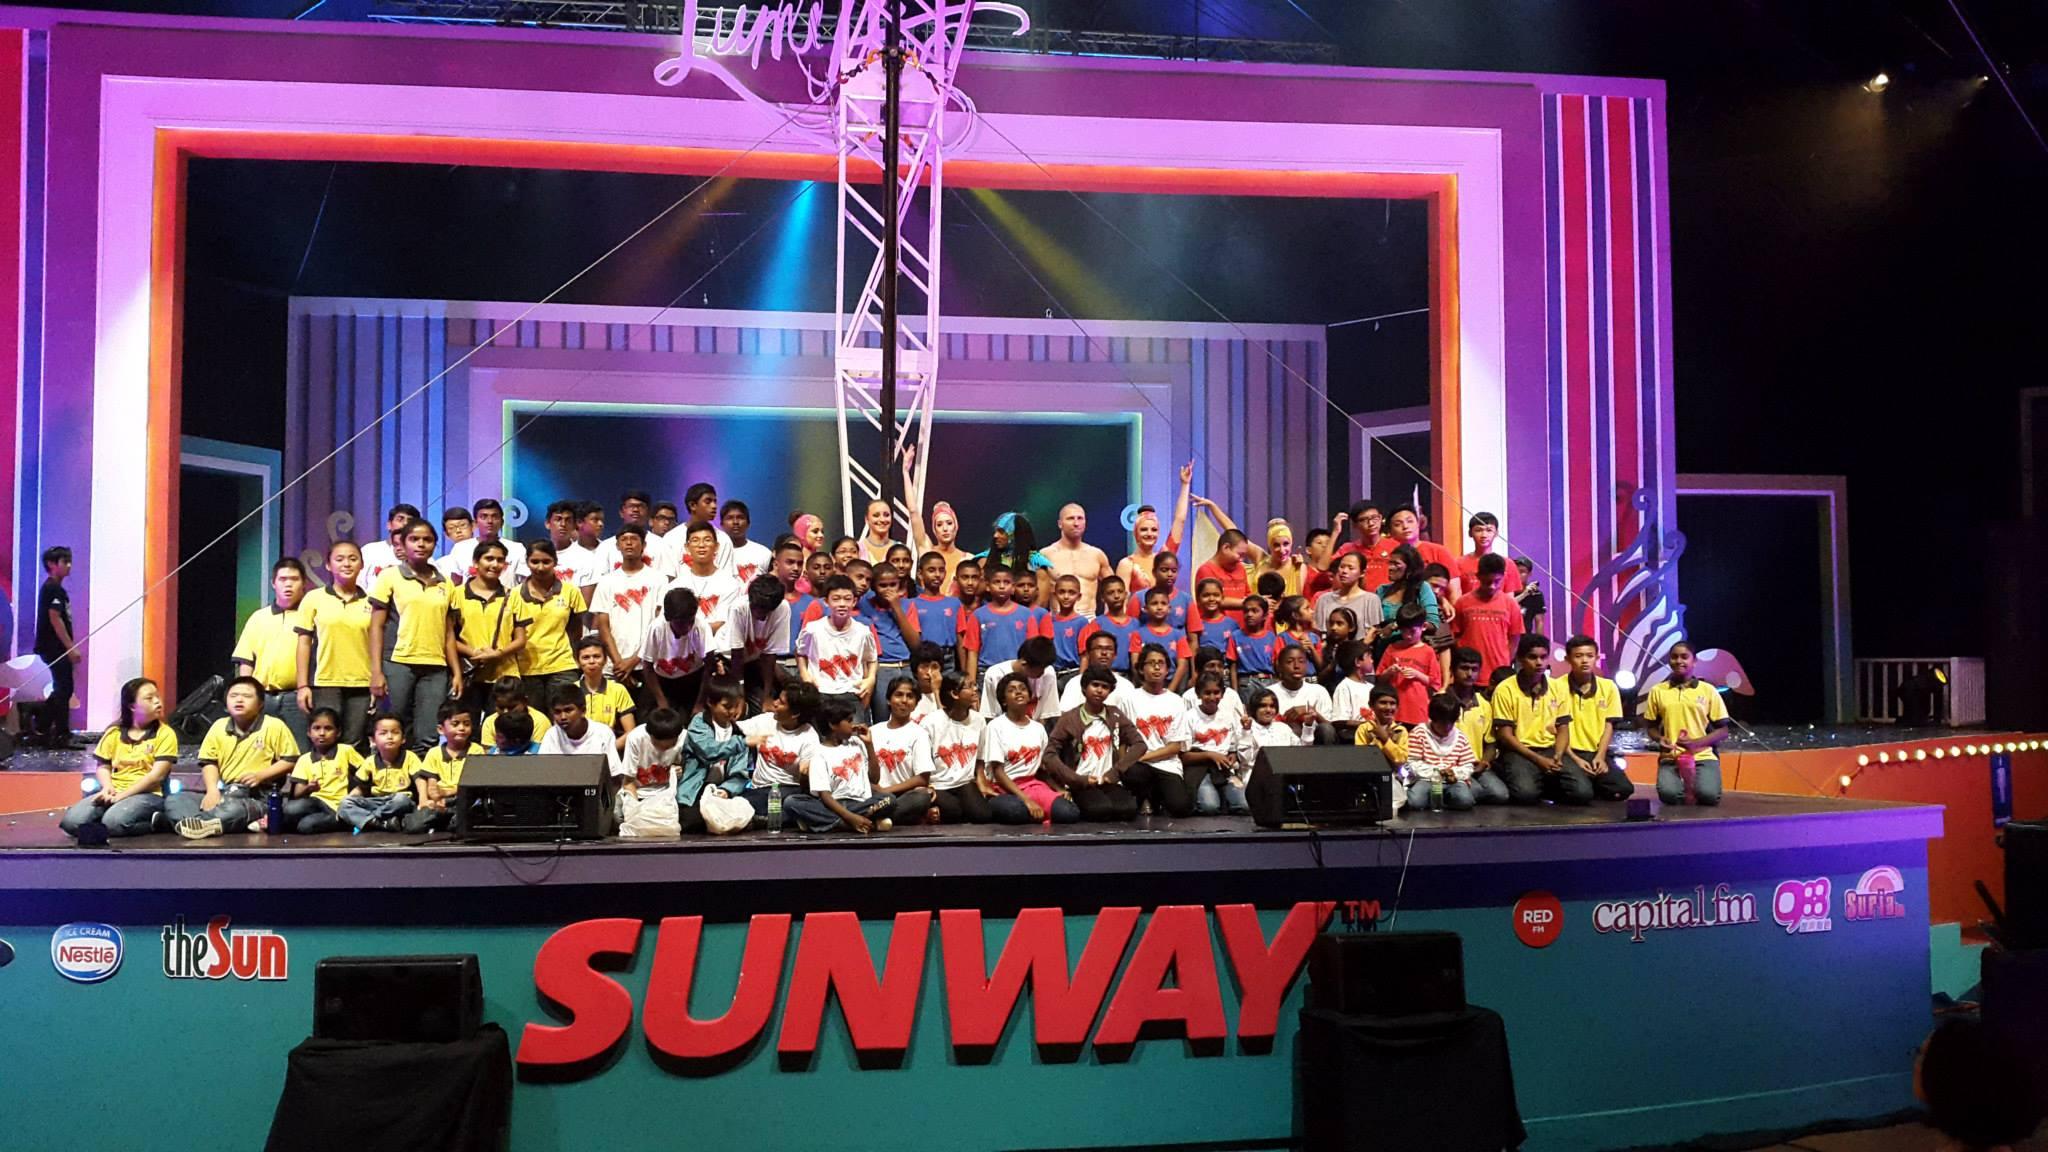 Live Show at Sunway Lagoon